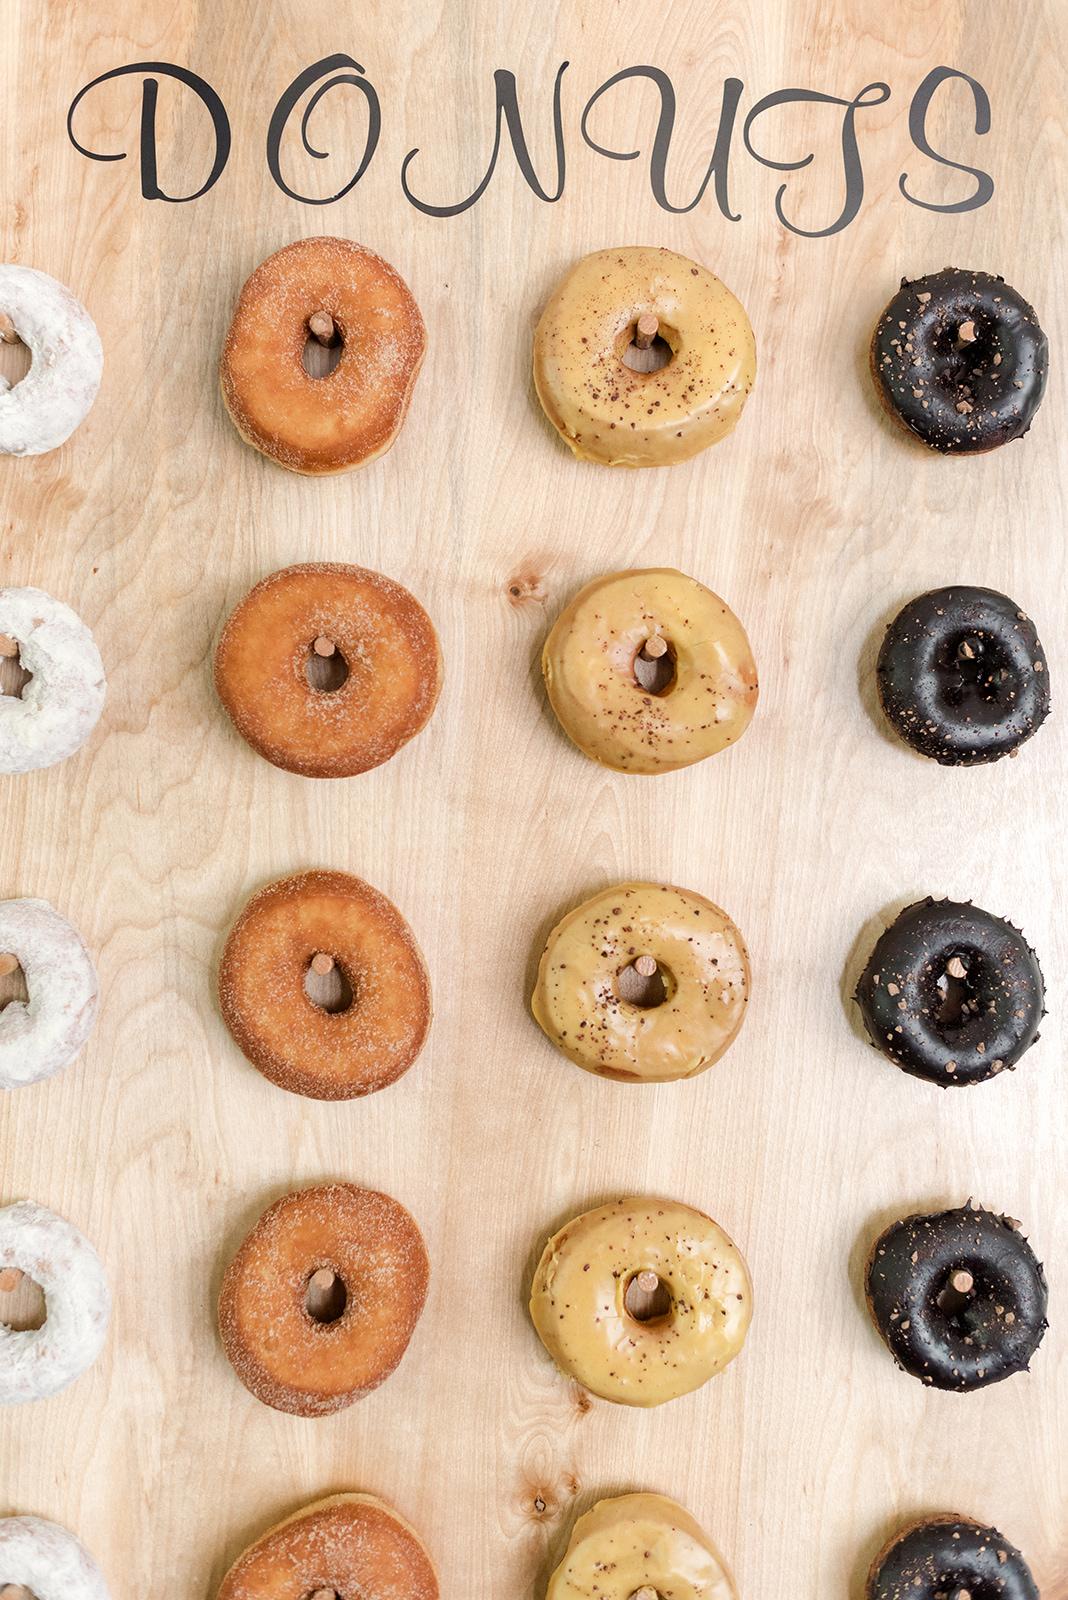 los angeles rams nfl player brandin cooks wedding donut doughnut wedding dessert